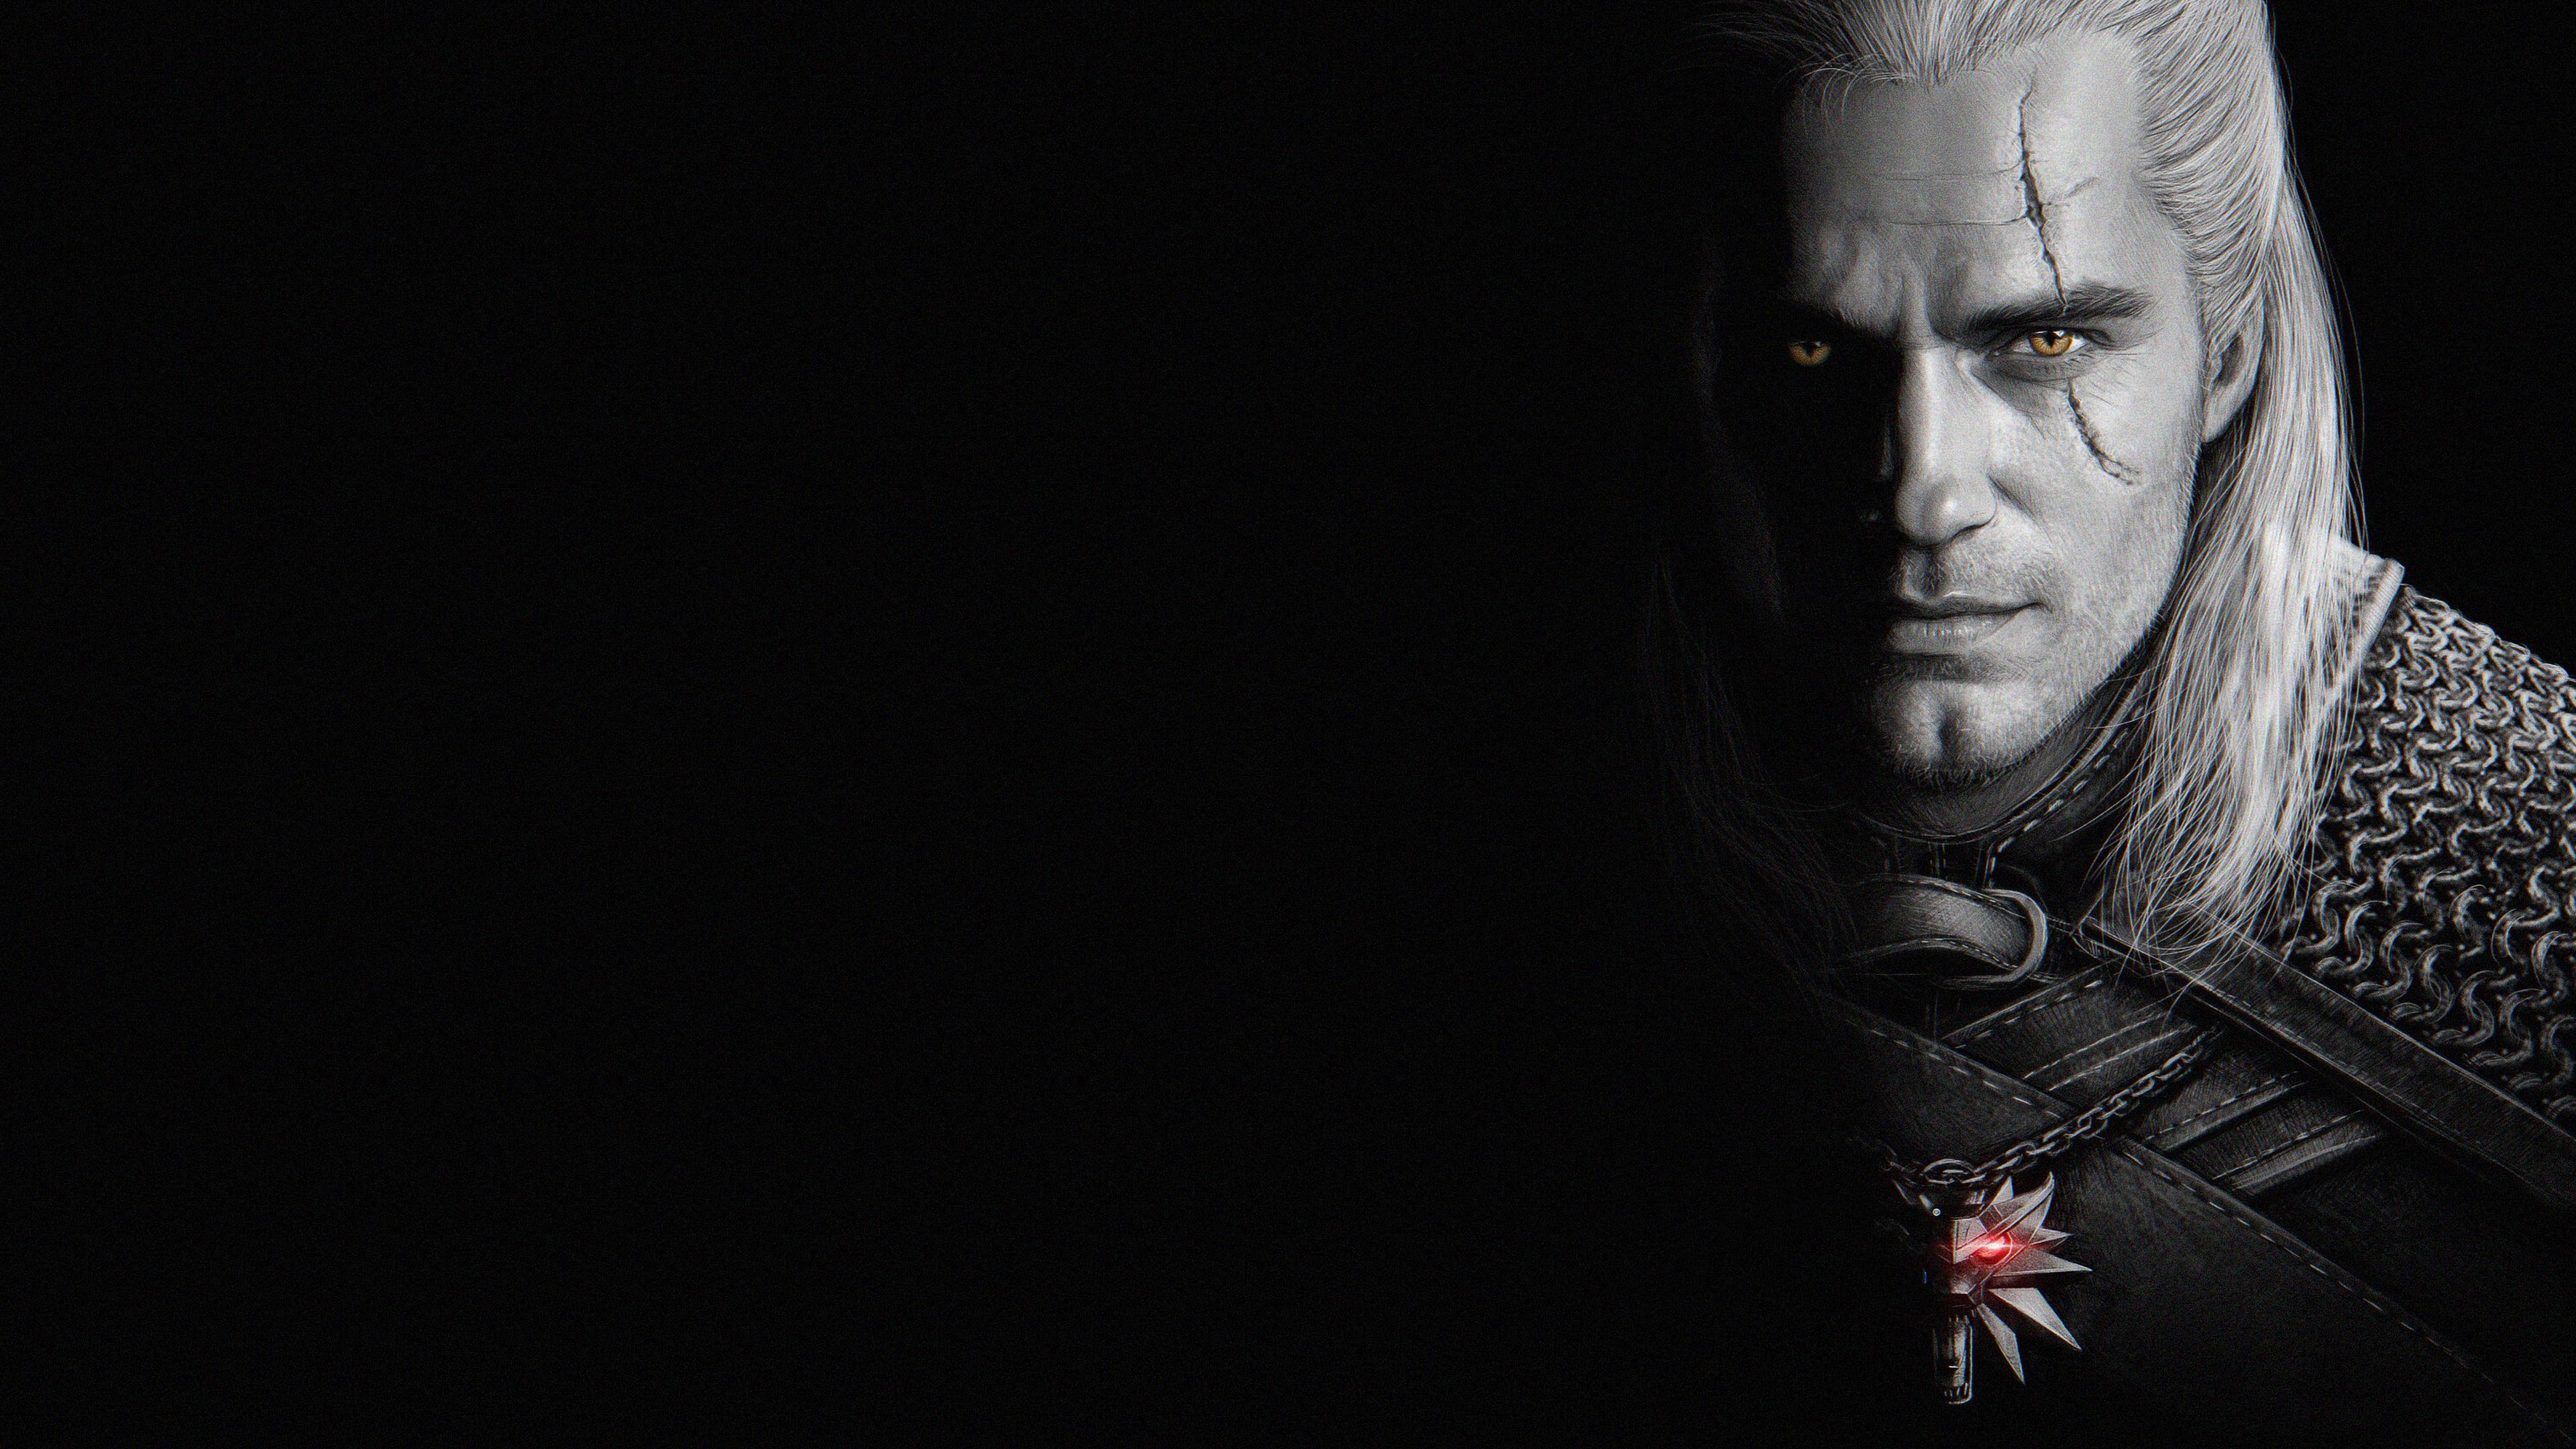 Henry Cavill As Geralt Of Rivia Wallpaper Hd Tv Series 4k